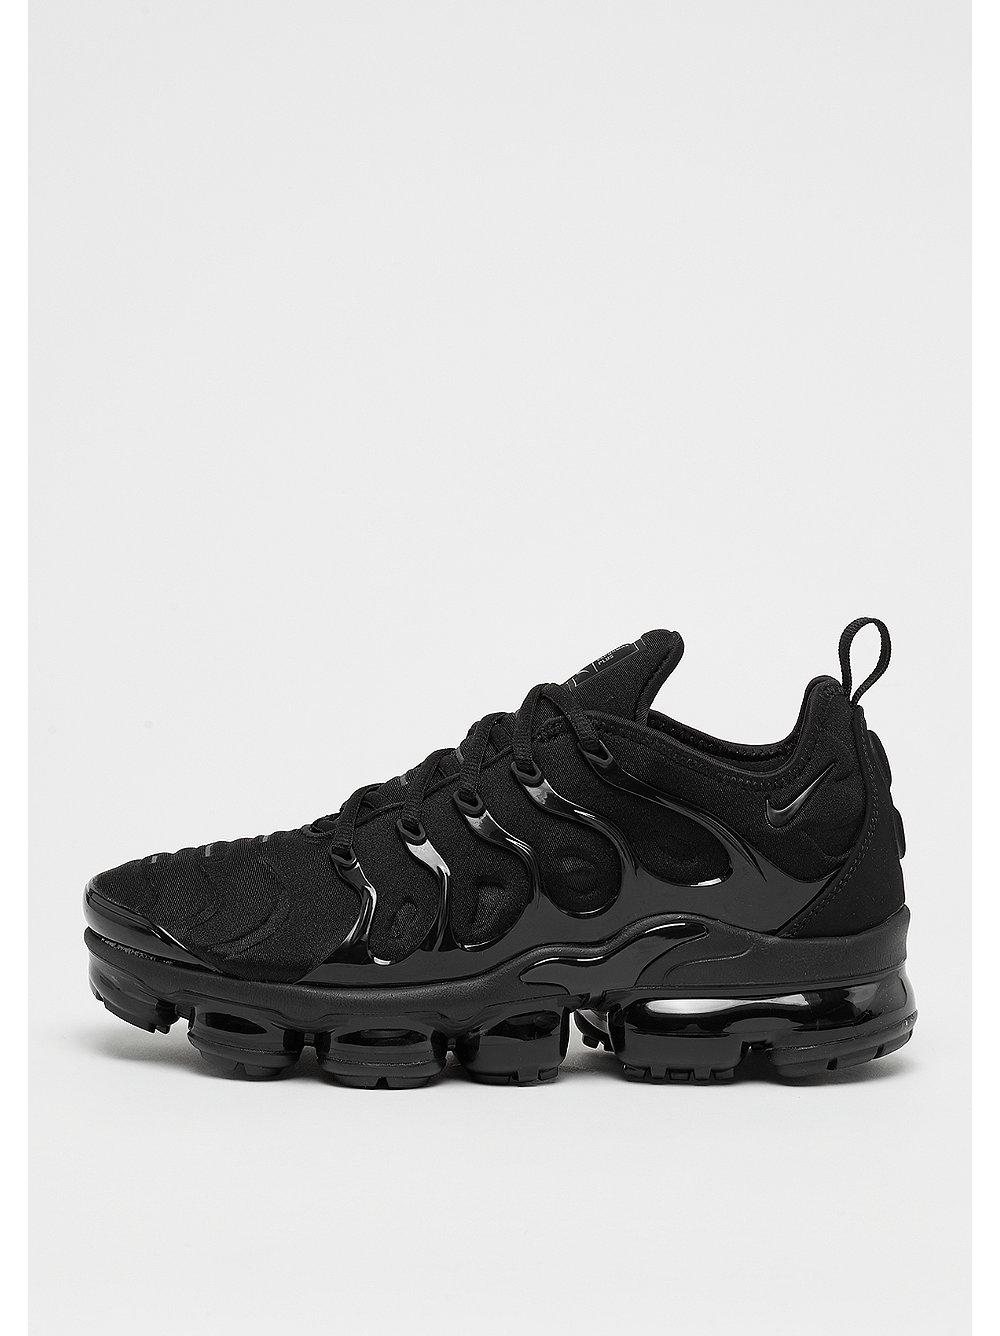 best service d8101 3bc08 Air VaporMax Plus black Sneaker von NIKE bei SNIPES!